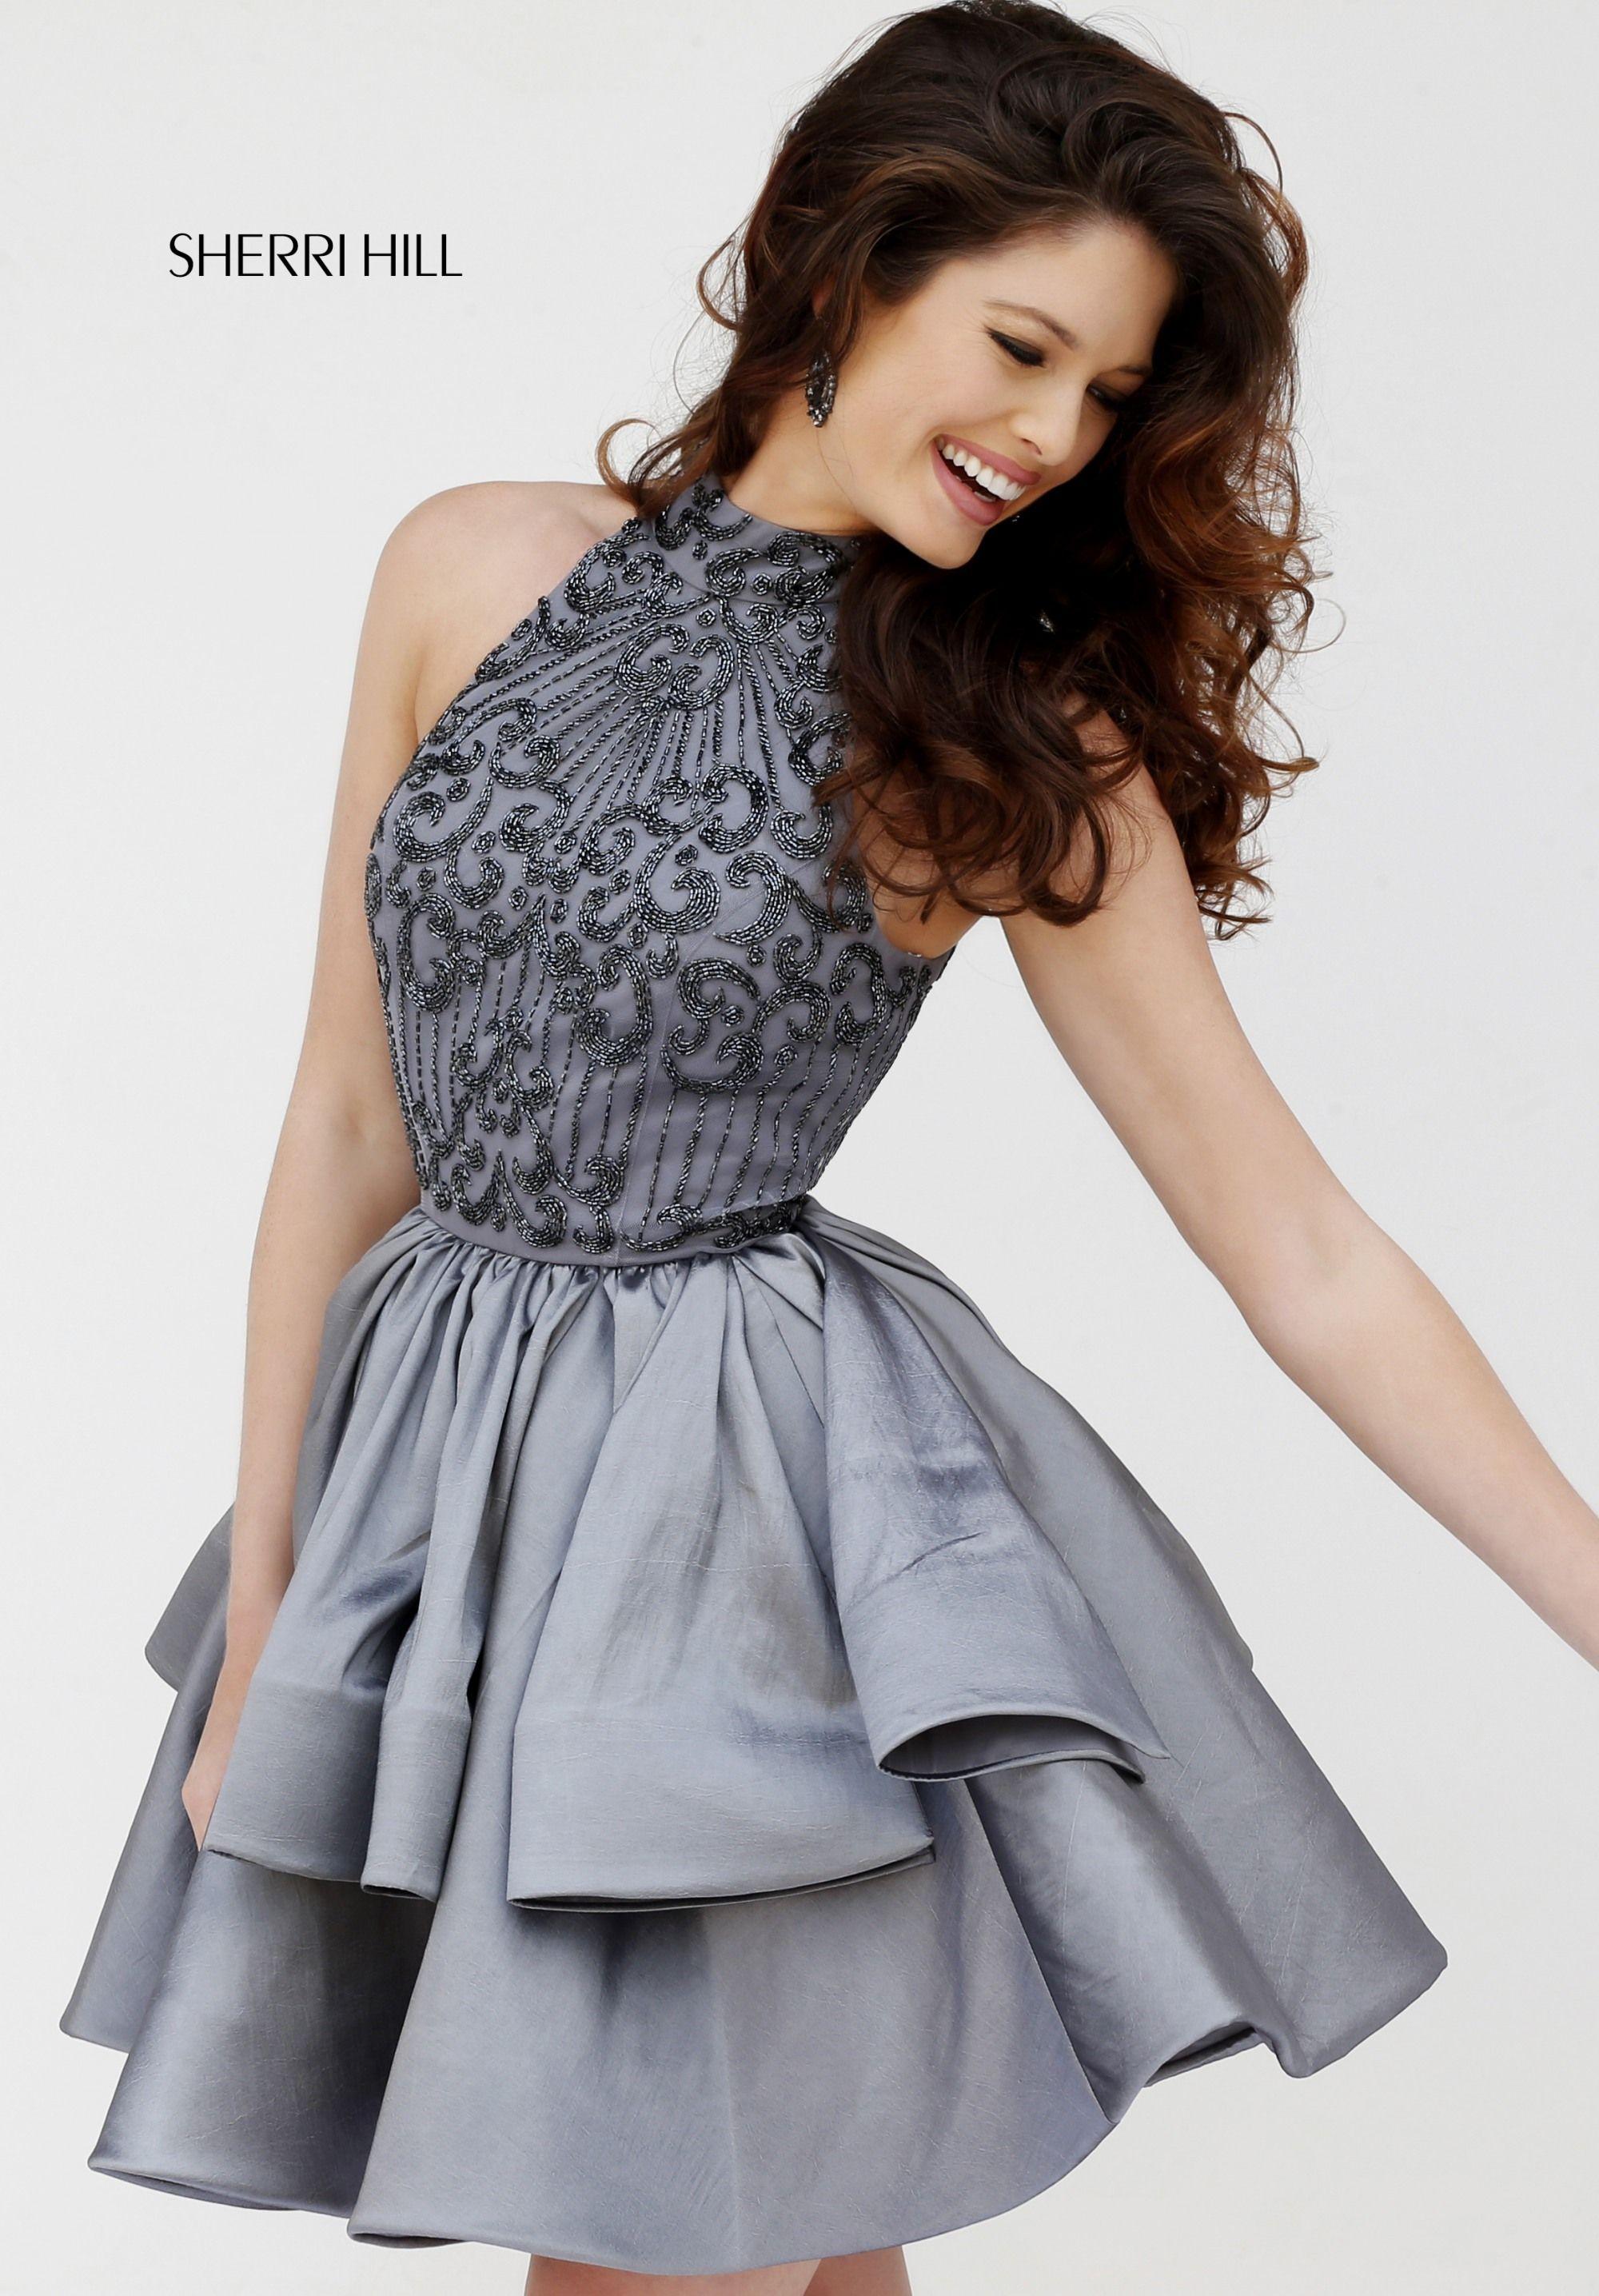 bd1e8f0994 Sherri Hill silver gunmetal grey short dress homecoming prom pageant cocktail  dress beading bodice halter top